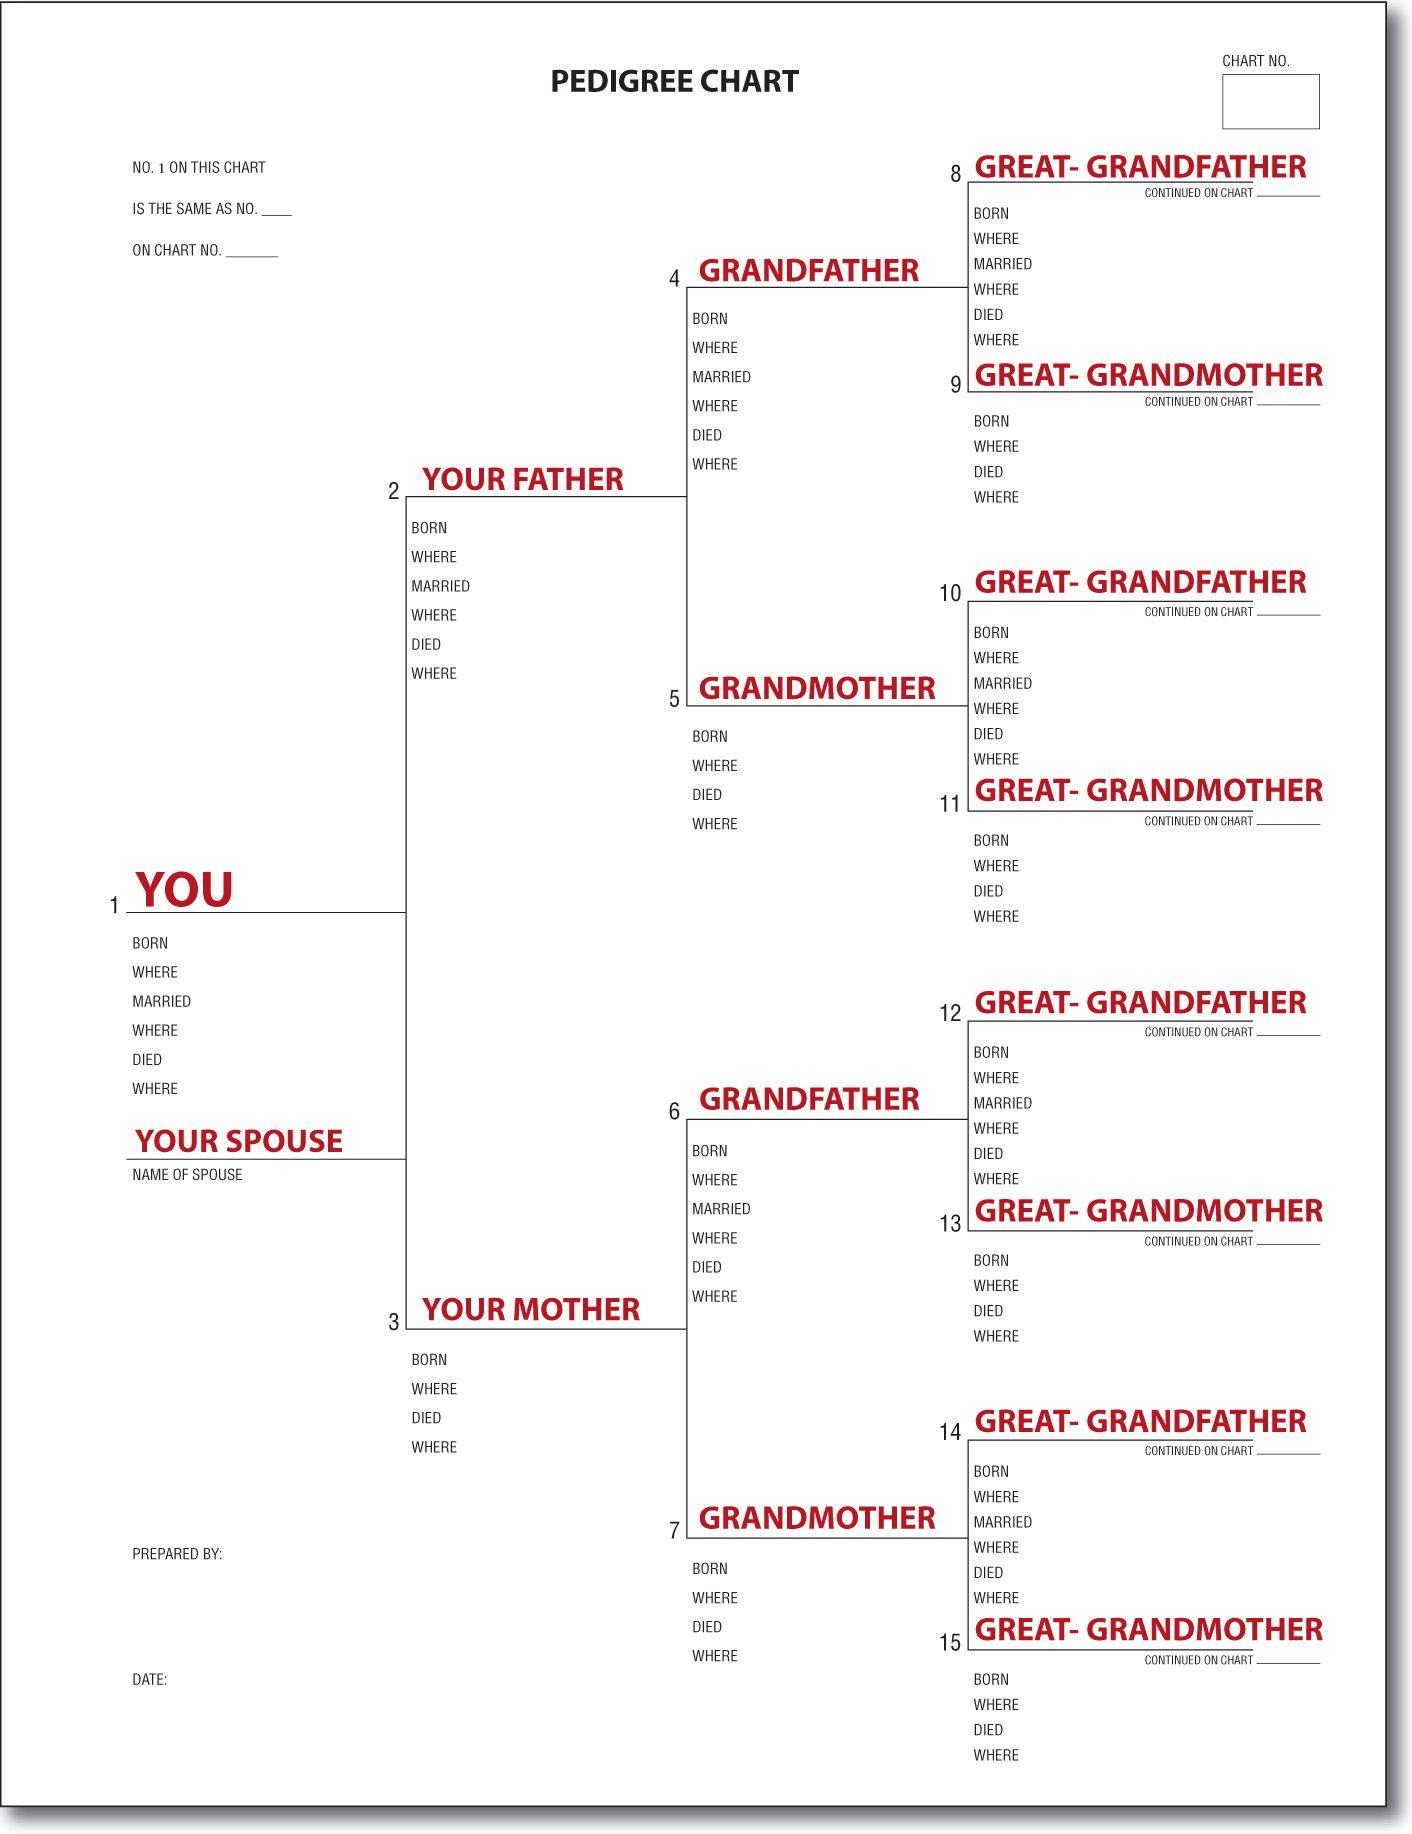 A Pedigree Chart